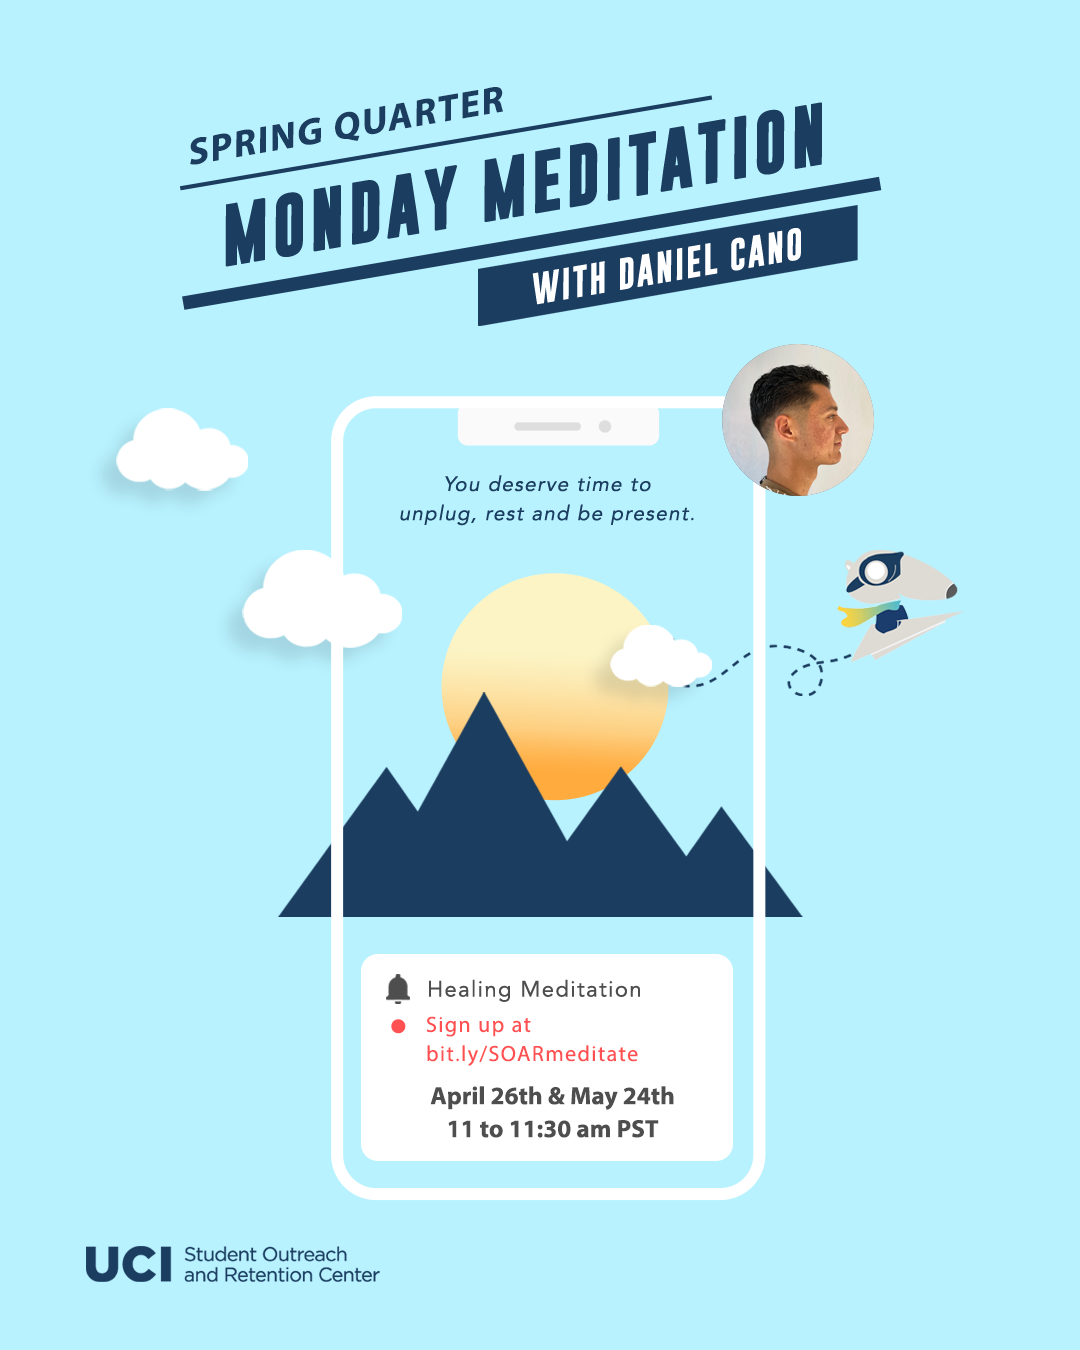 S21 Monday Meditation Flyer (Instagram)